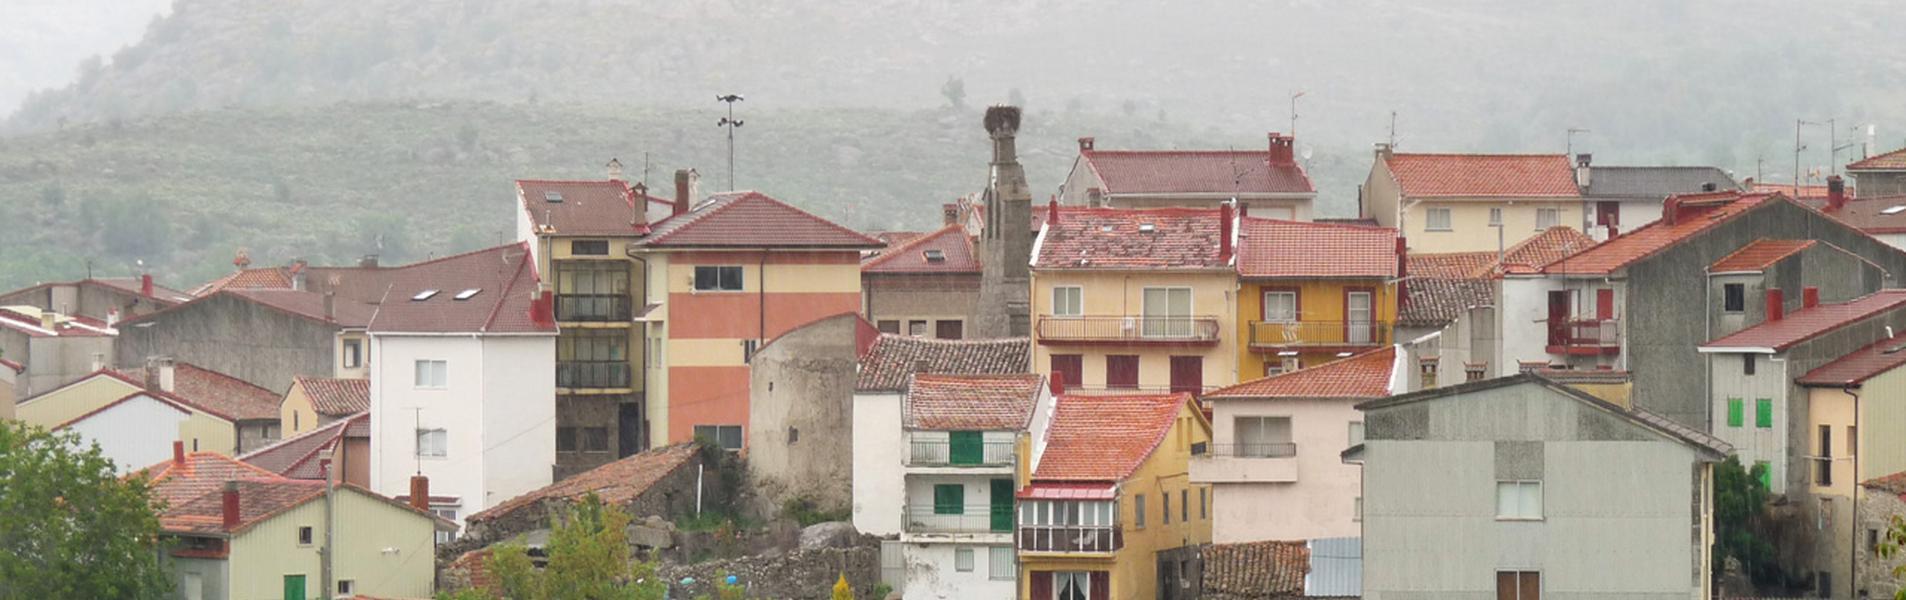 Navarrevisca